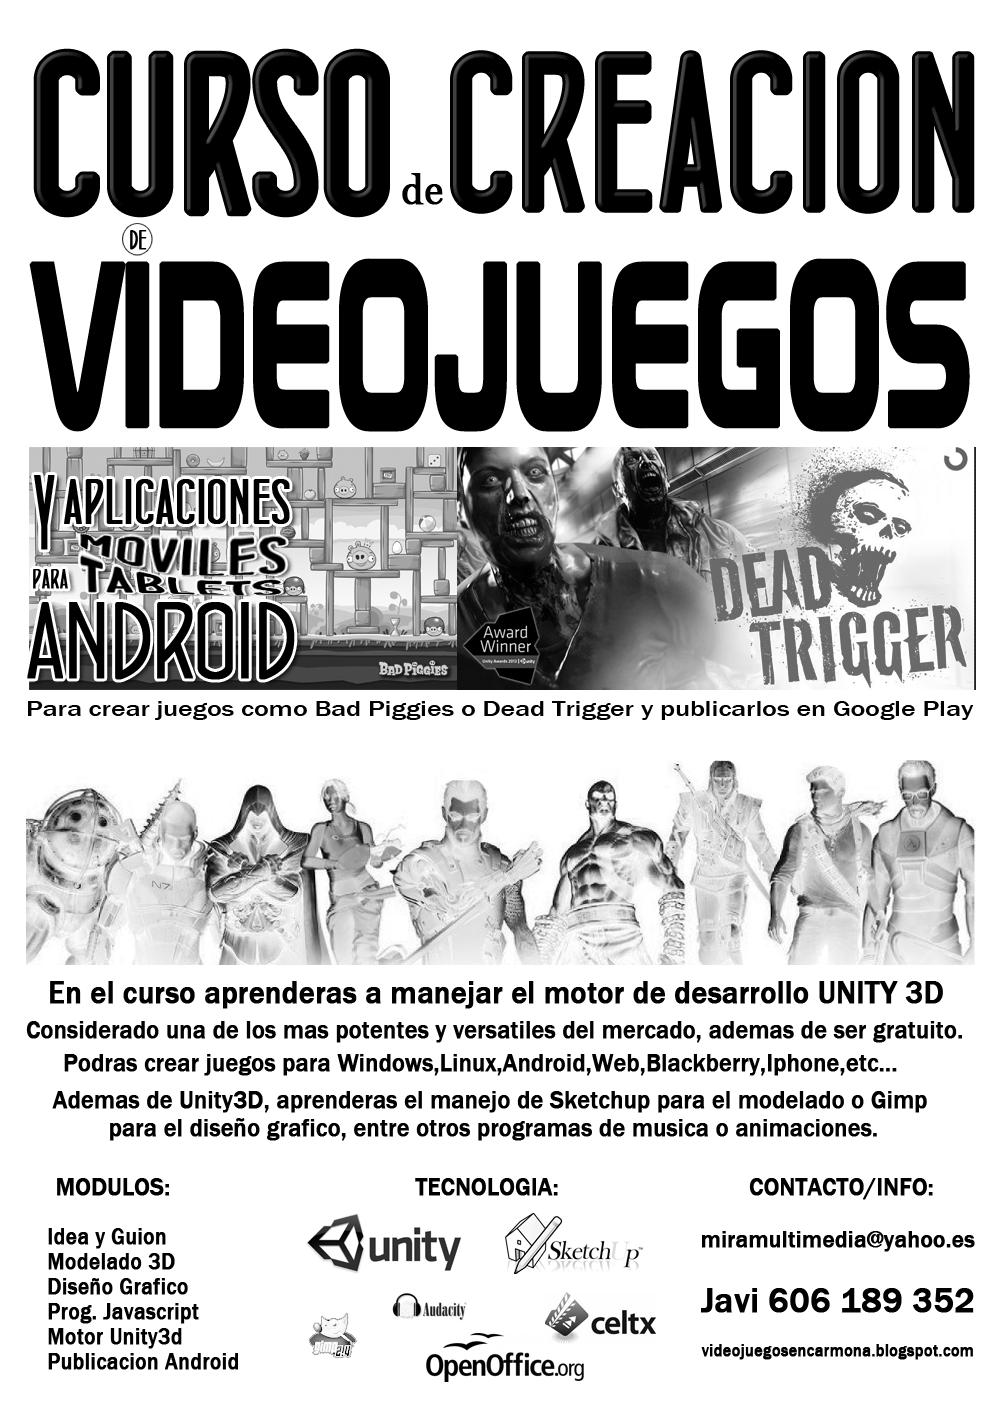 DISEÑA TU PROPIO VIDEOJUEGO